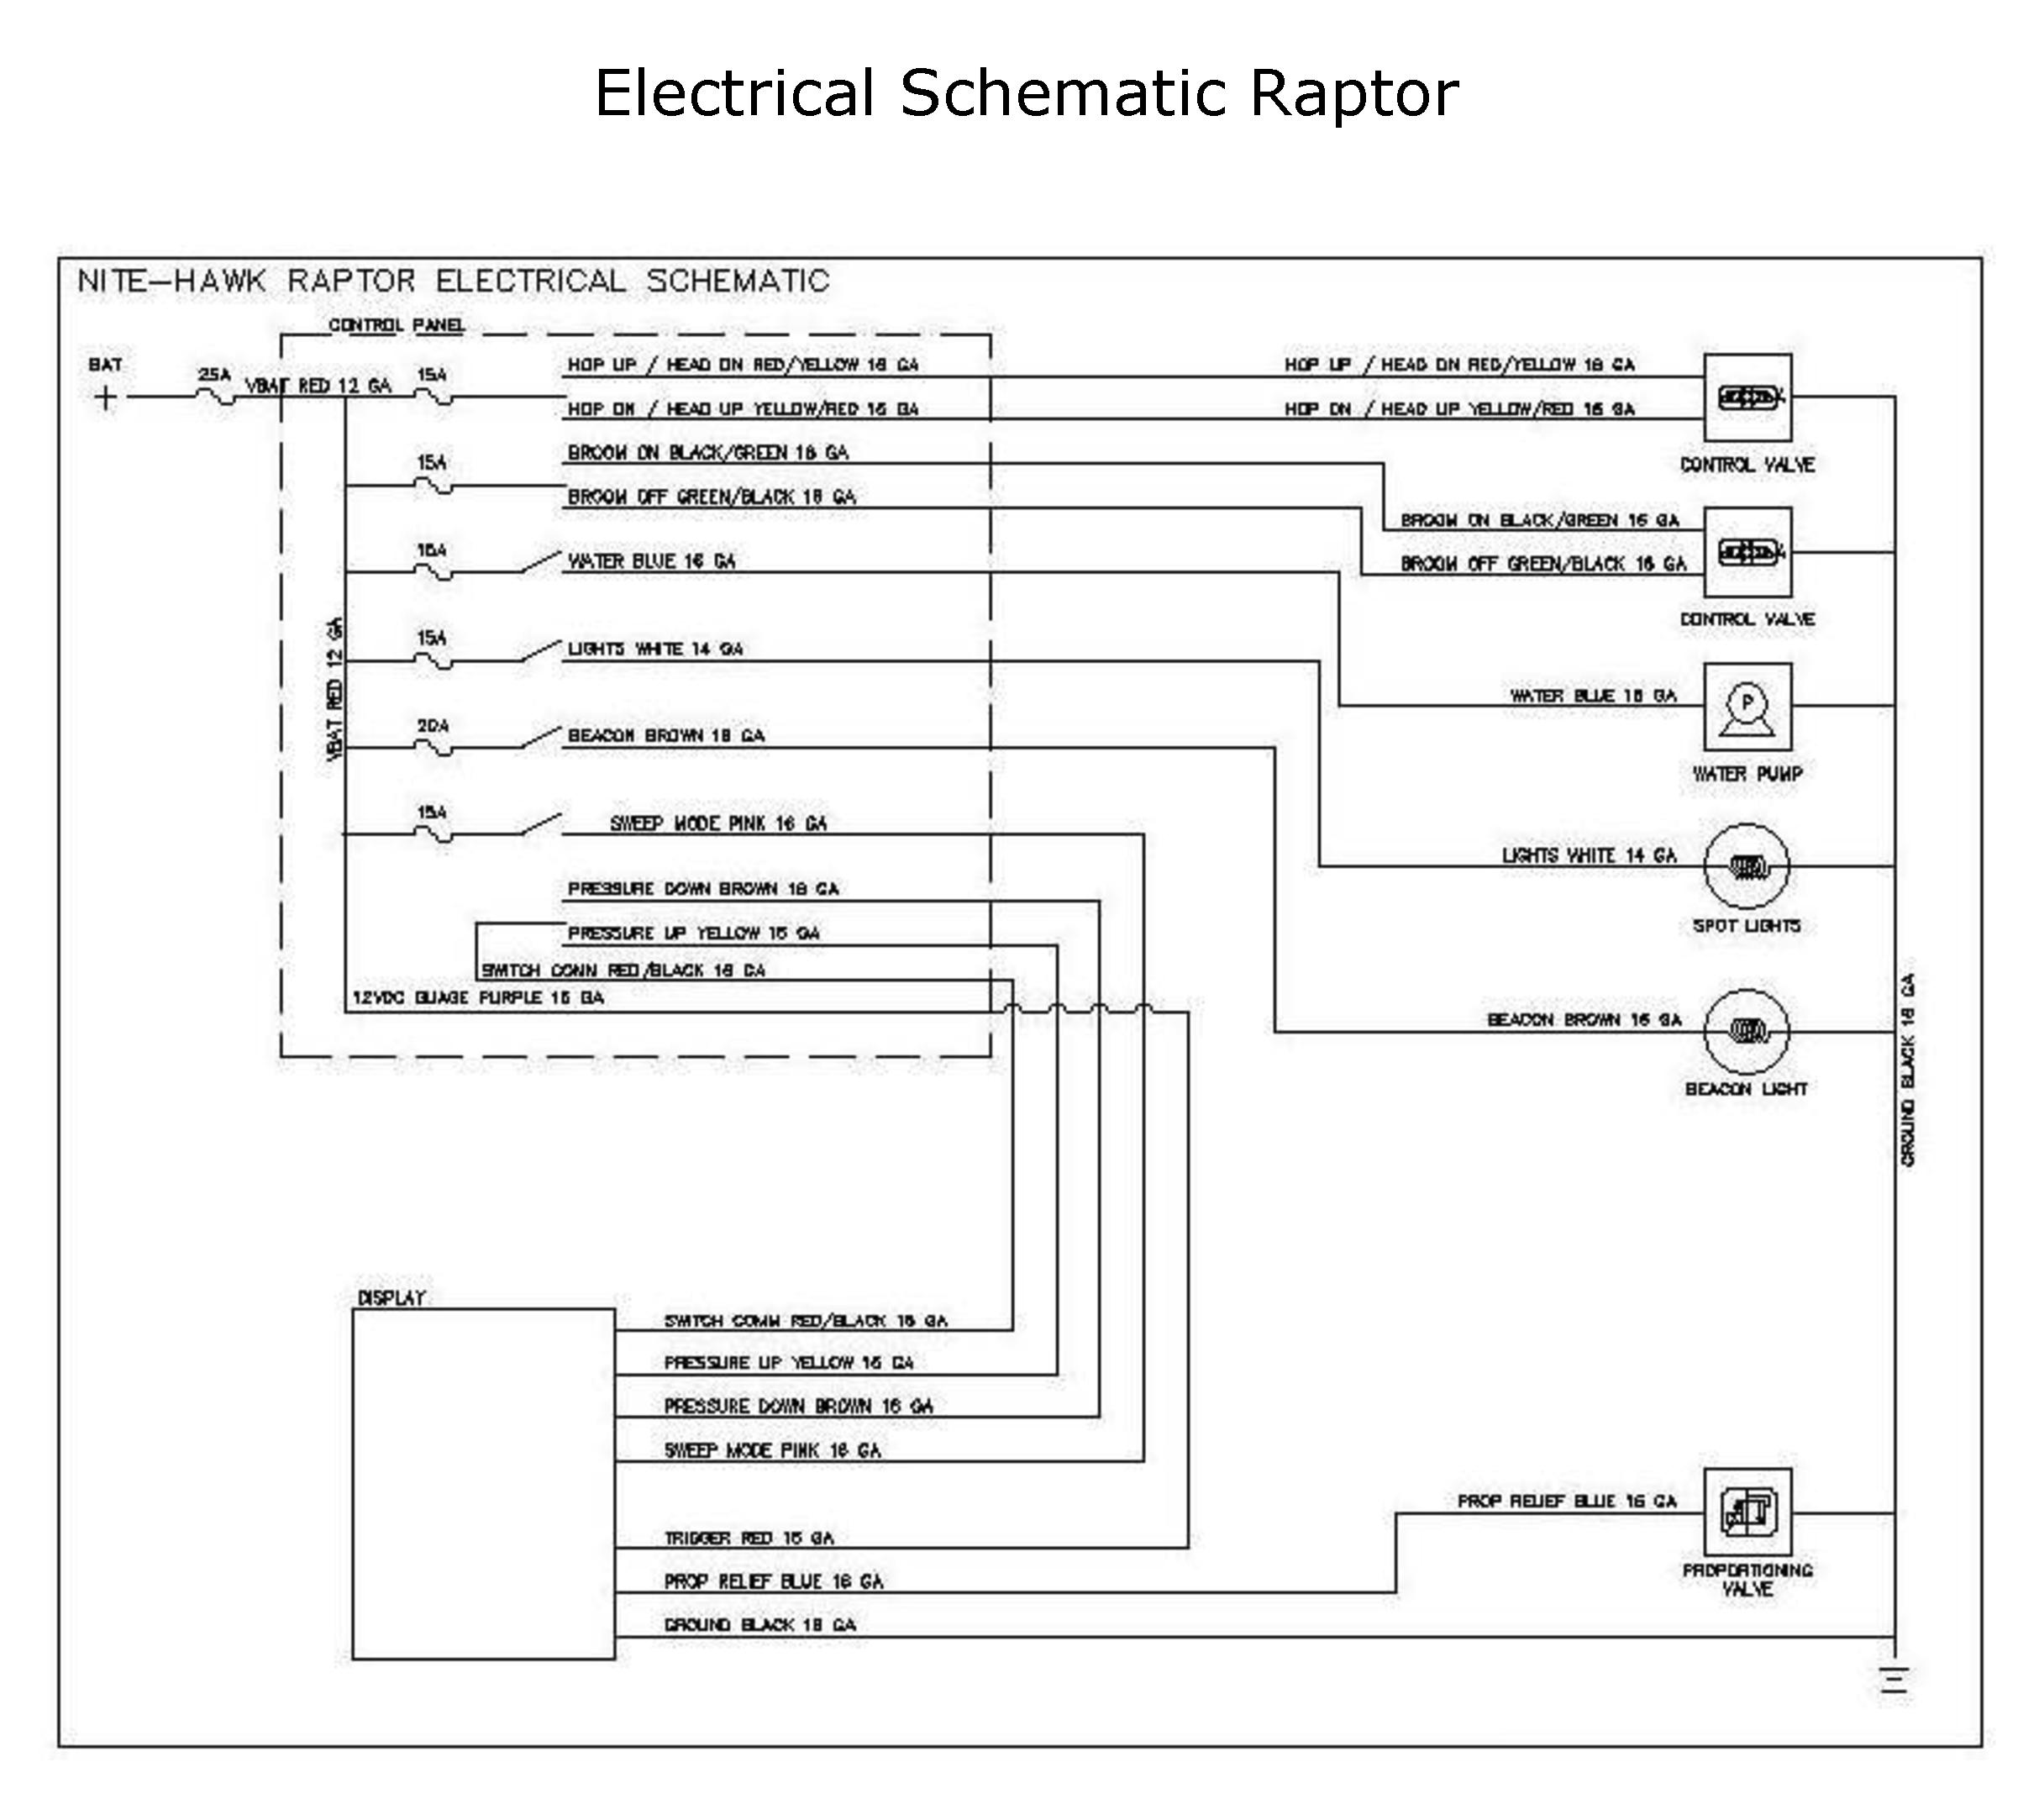 raptor electrical schematic rh buysweeperparts com Osprey Bird Typhoon Storm Diagram